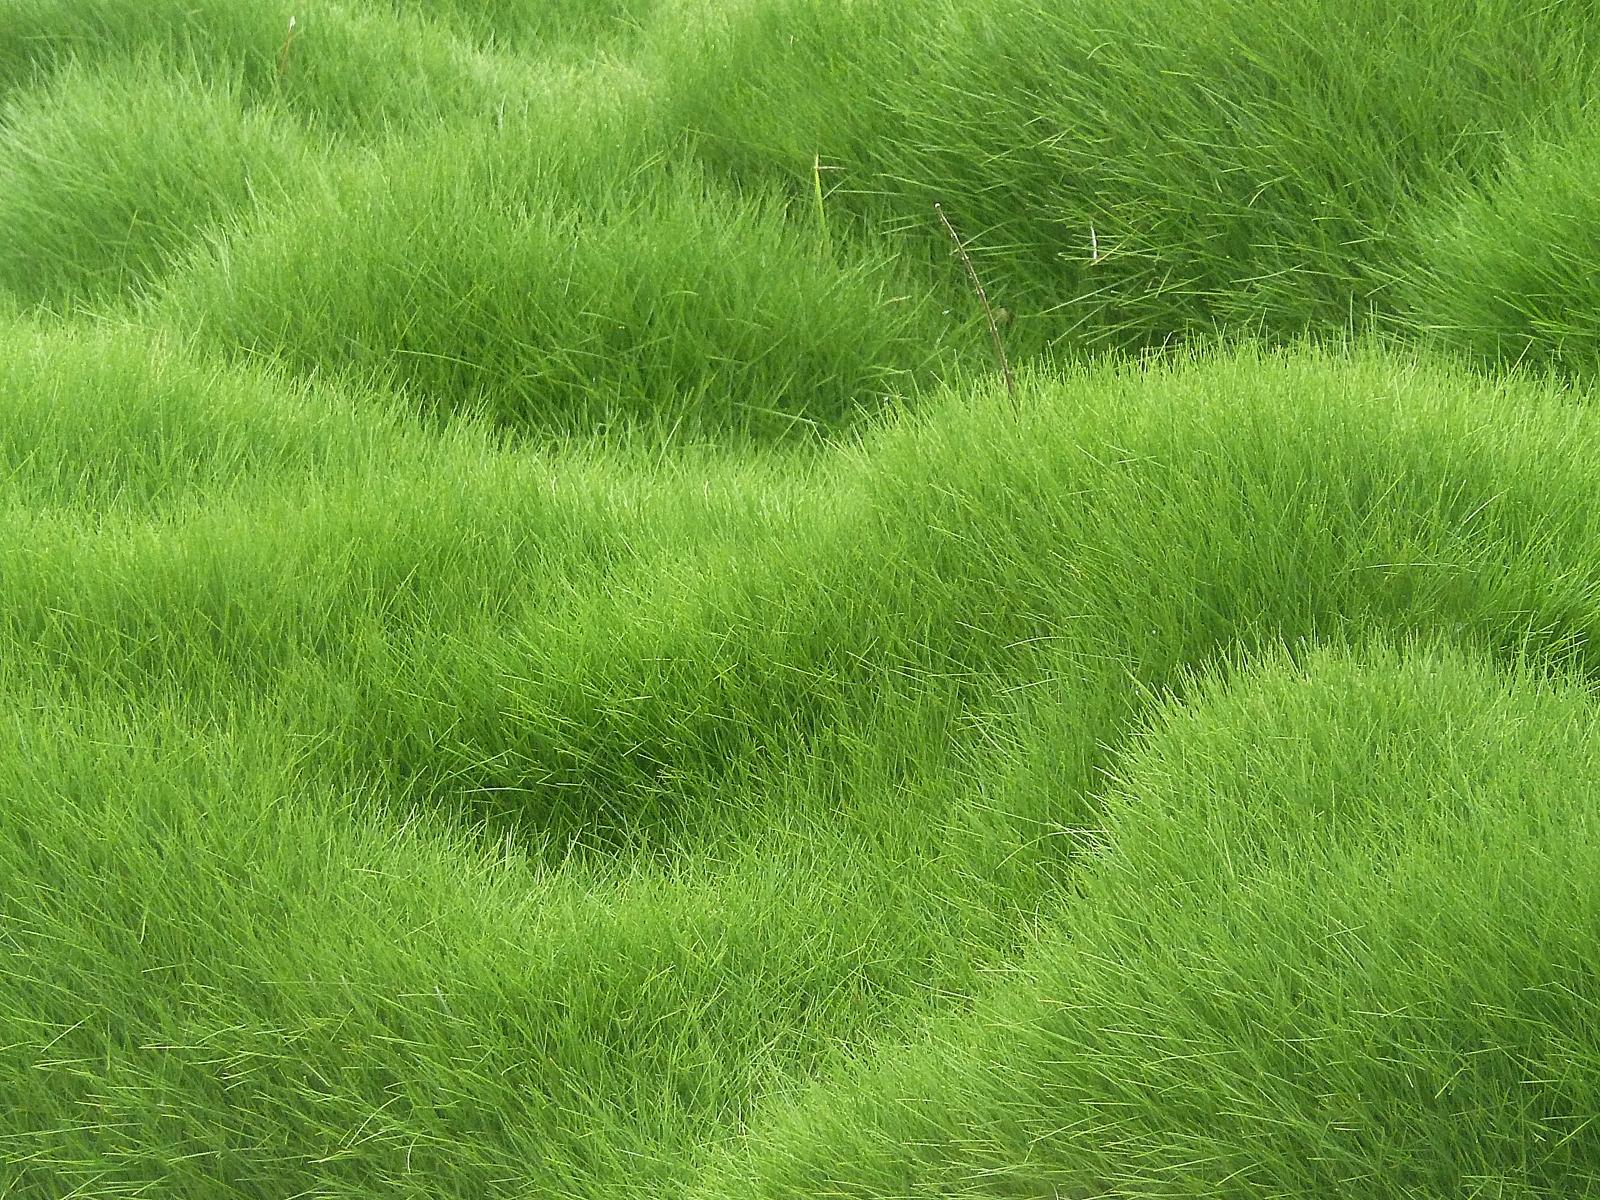 Fond d'écran : herbe, champ, vert, texture, fleur, prairie, plante, pâturage, Prairie, pelouse ...